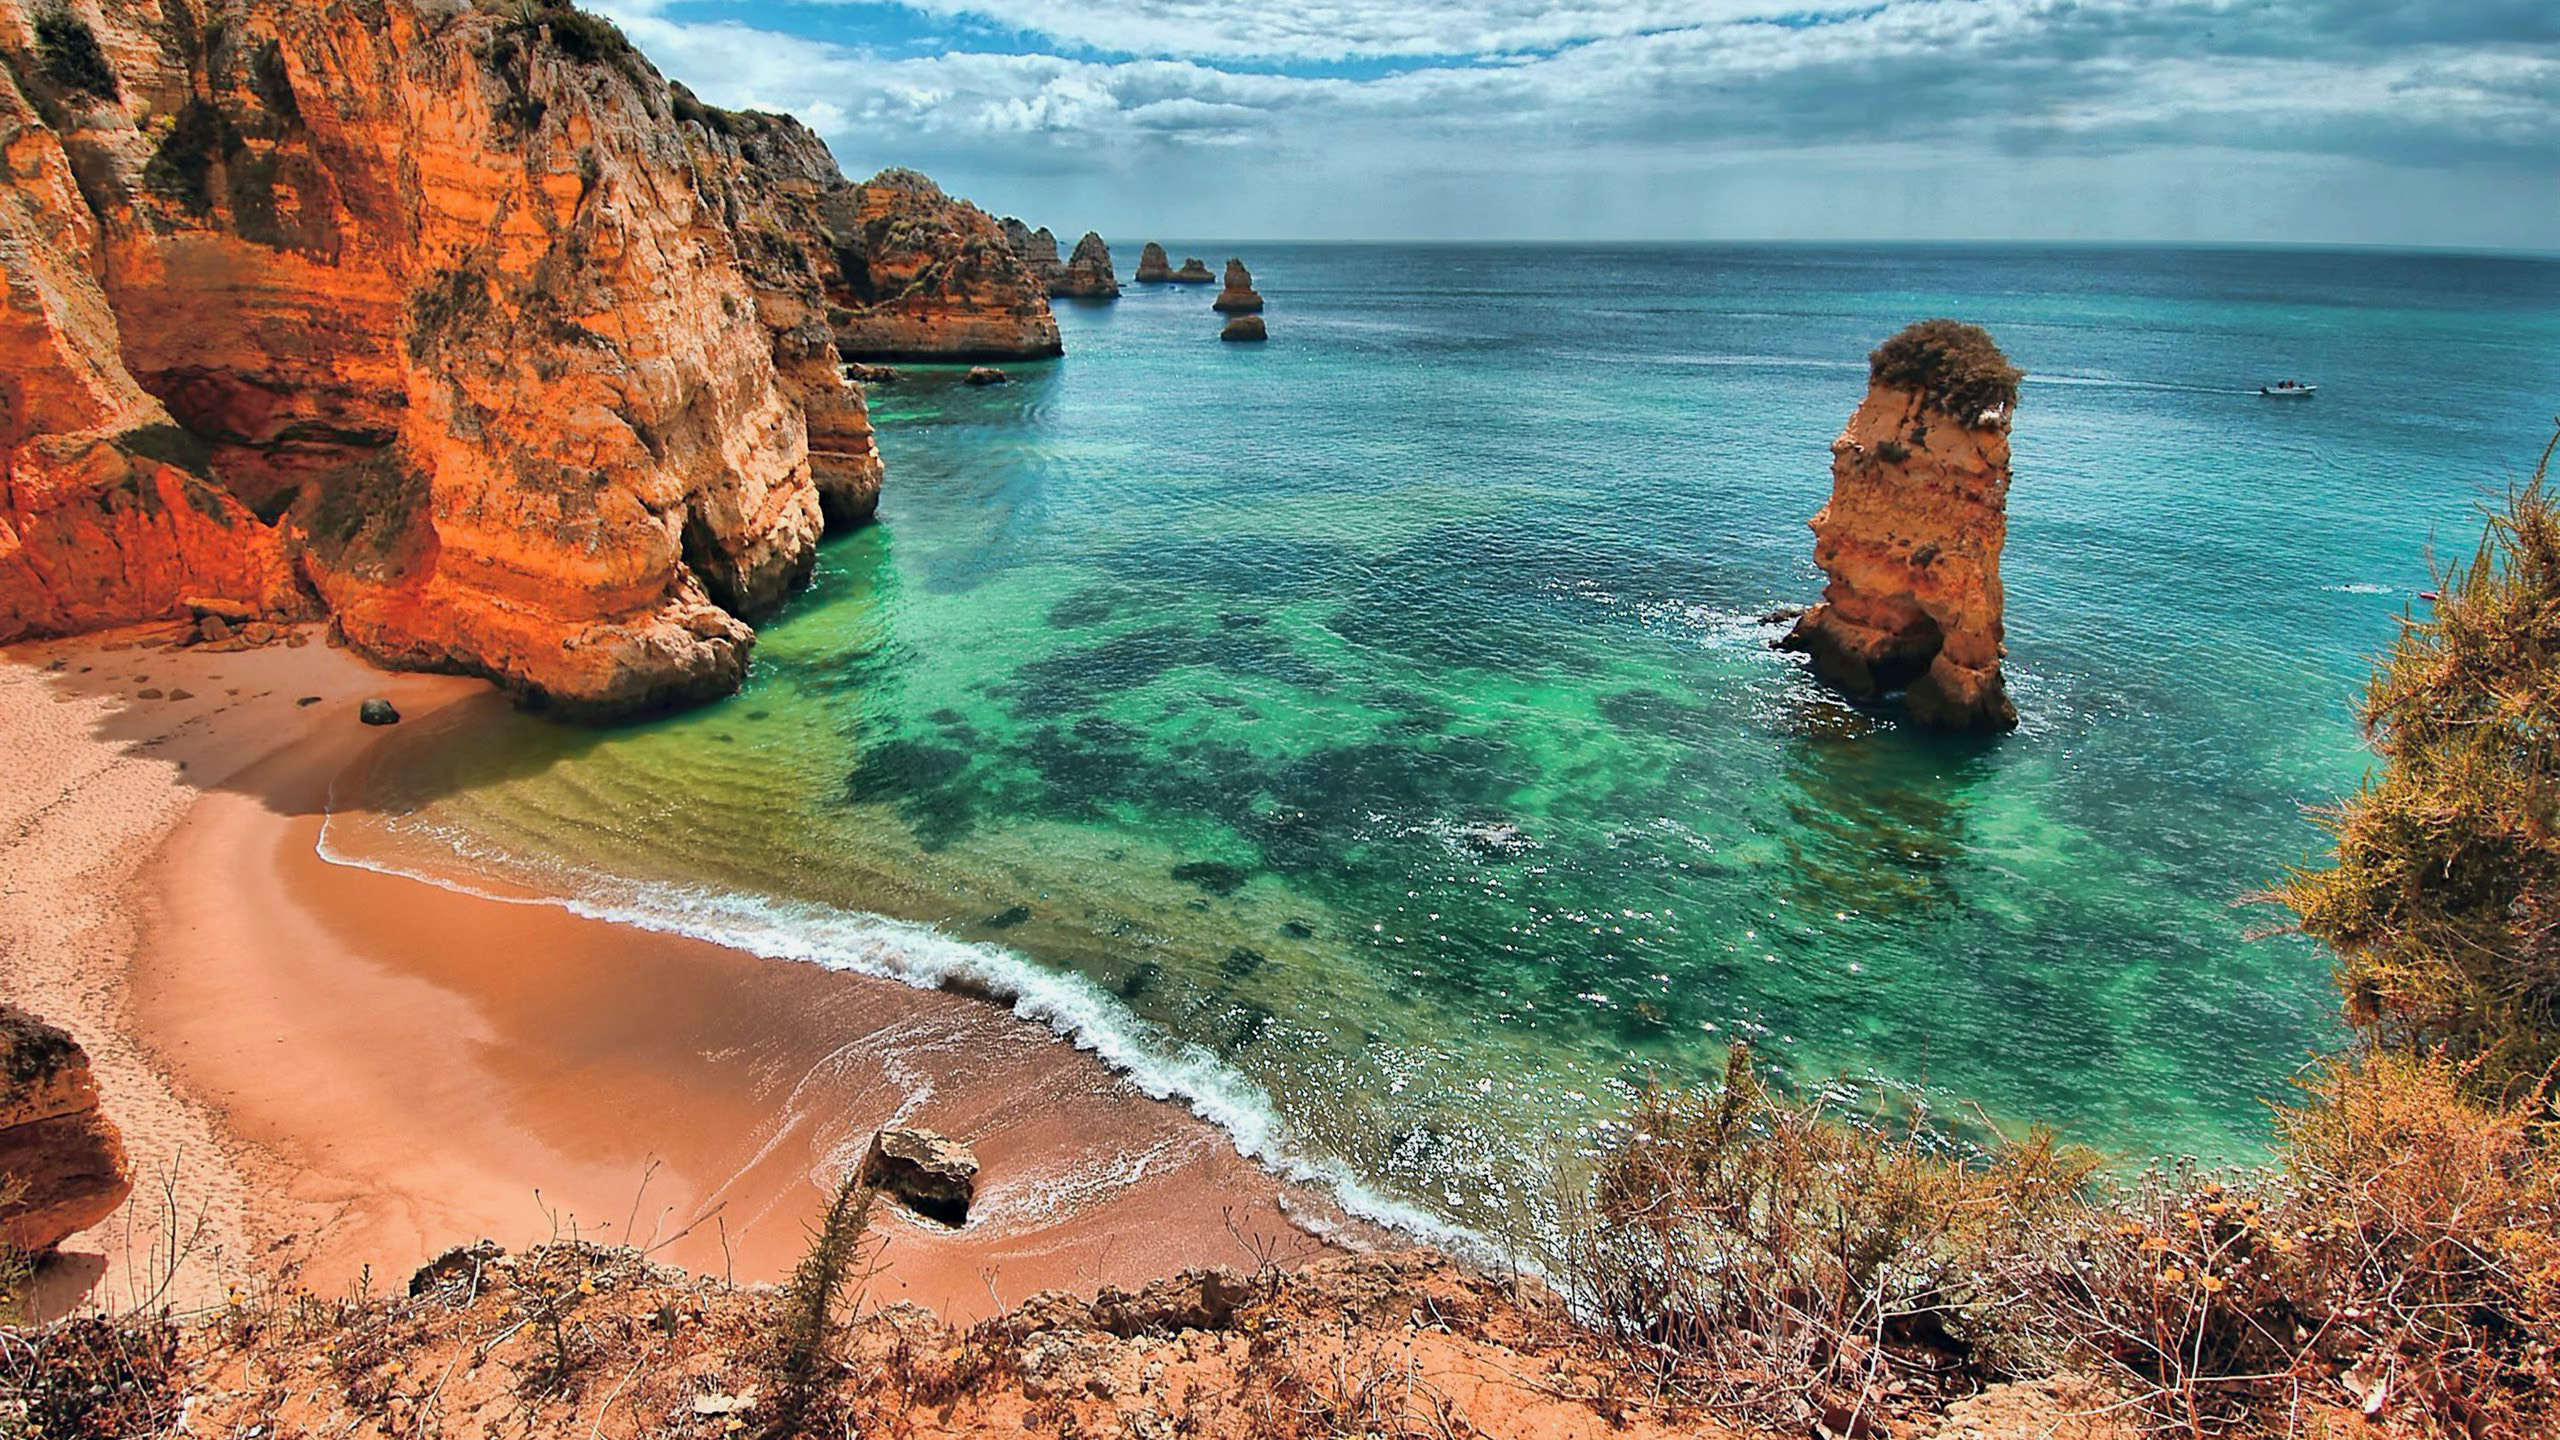 HDoboi.Kiev.ua - обои море на айфон 8, Морское побережье, Португалия, пляж, песок, скалы